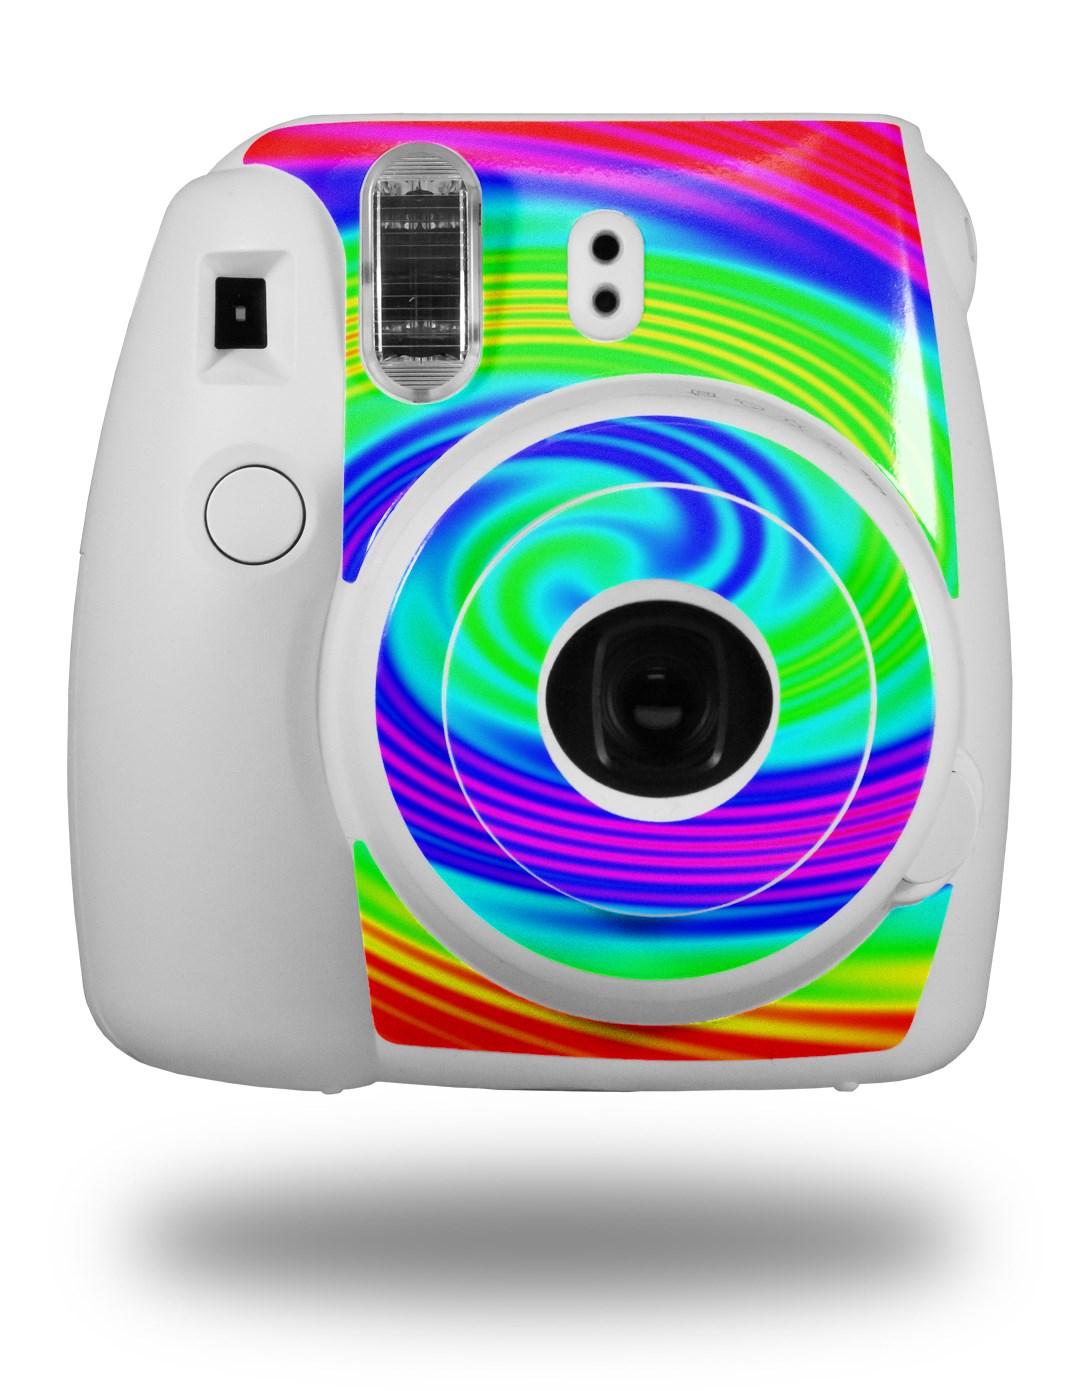 фотокамера и радуга много слов унисон